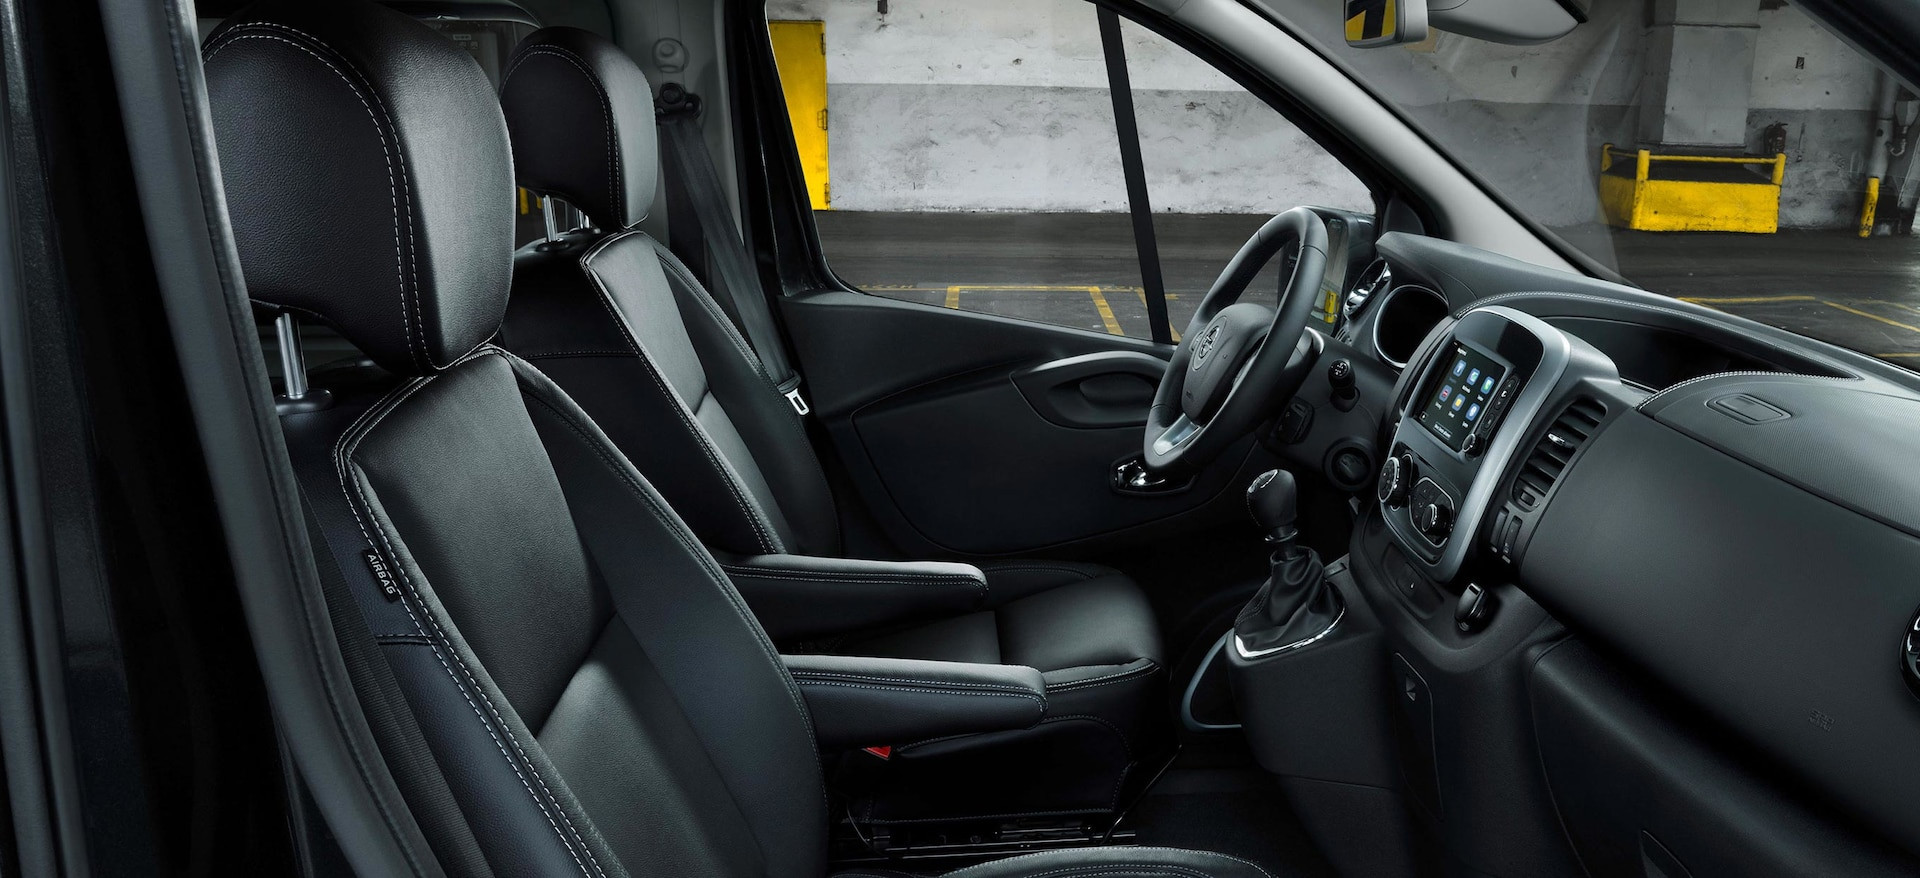 Opel_Vivaro_Tourer_Drivers_Cabin_21x9_vi